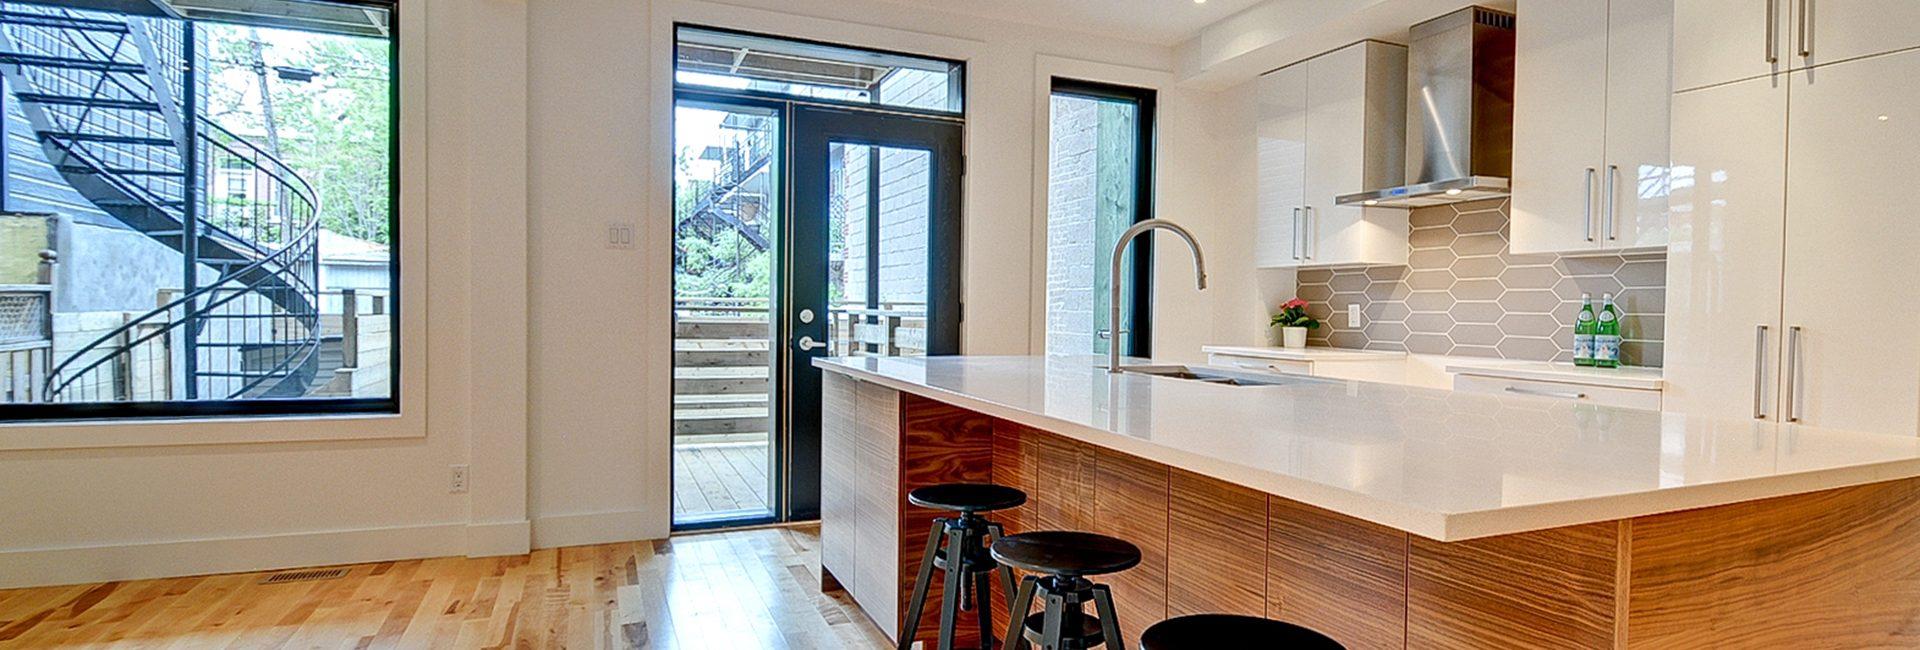 exur_immobilier-projet_st-denis_003